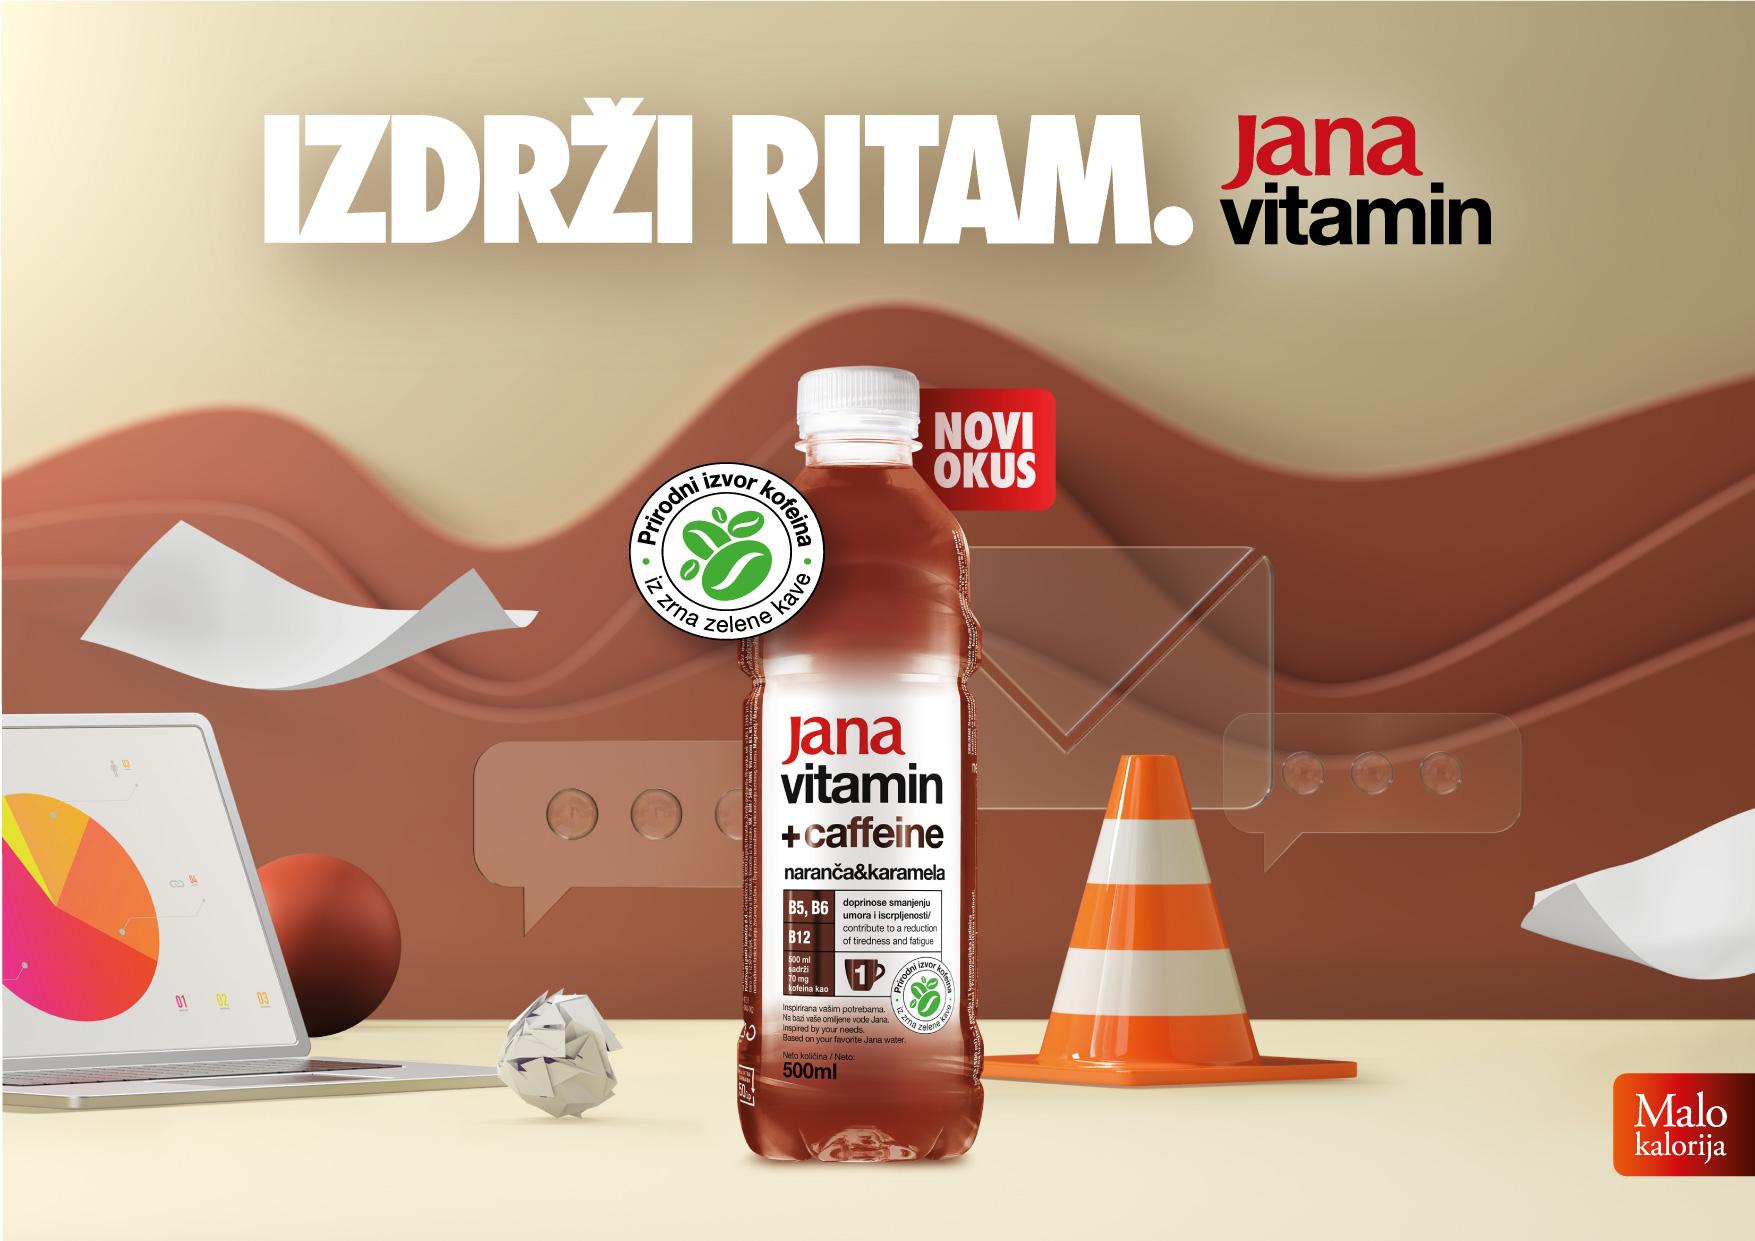 Jana vitamin s kofeinom